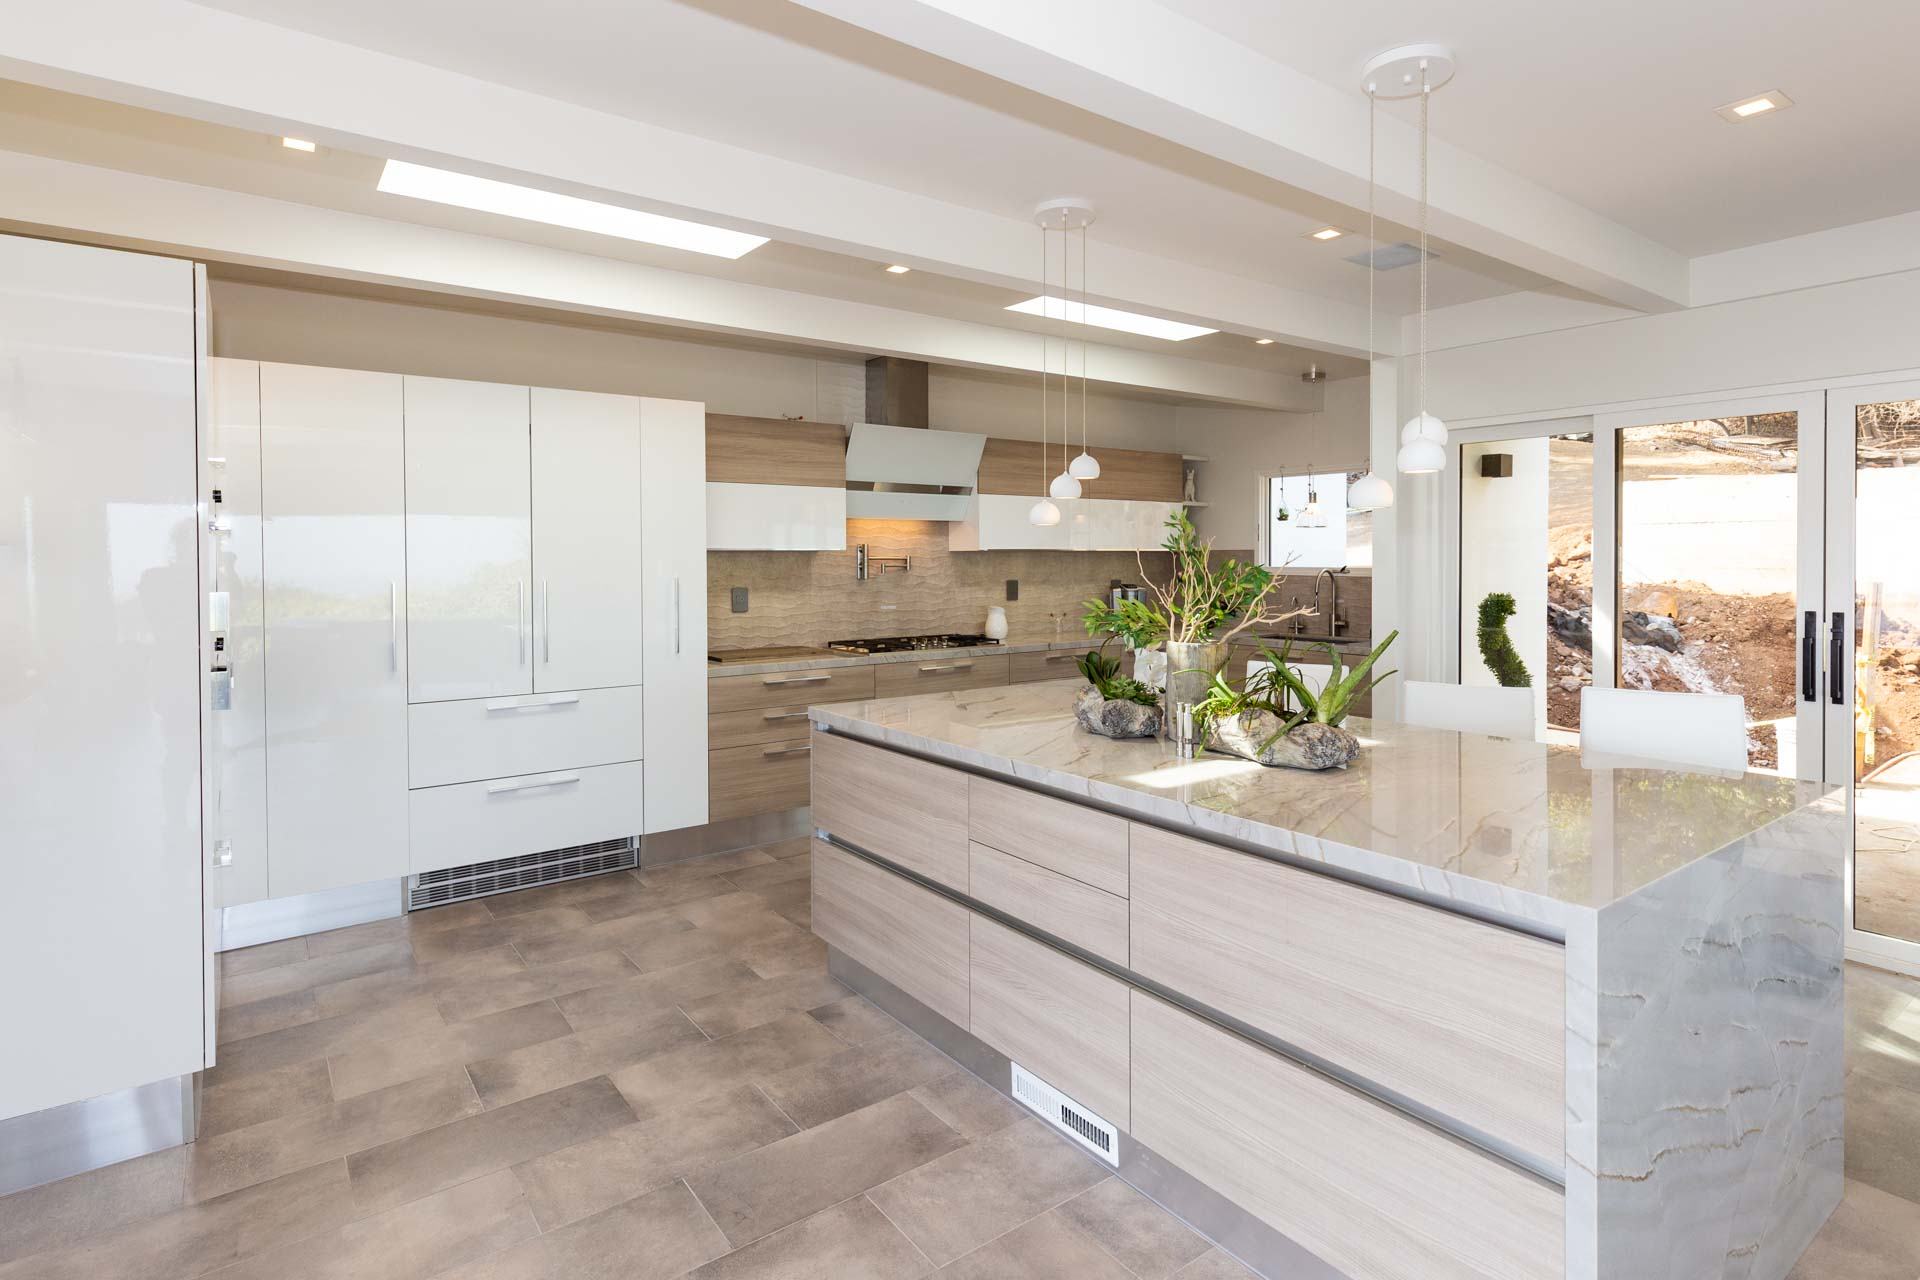 Beige and white kitchen with impressive greenery on island